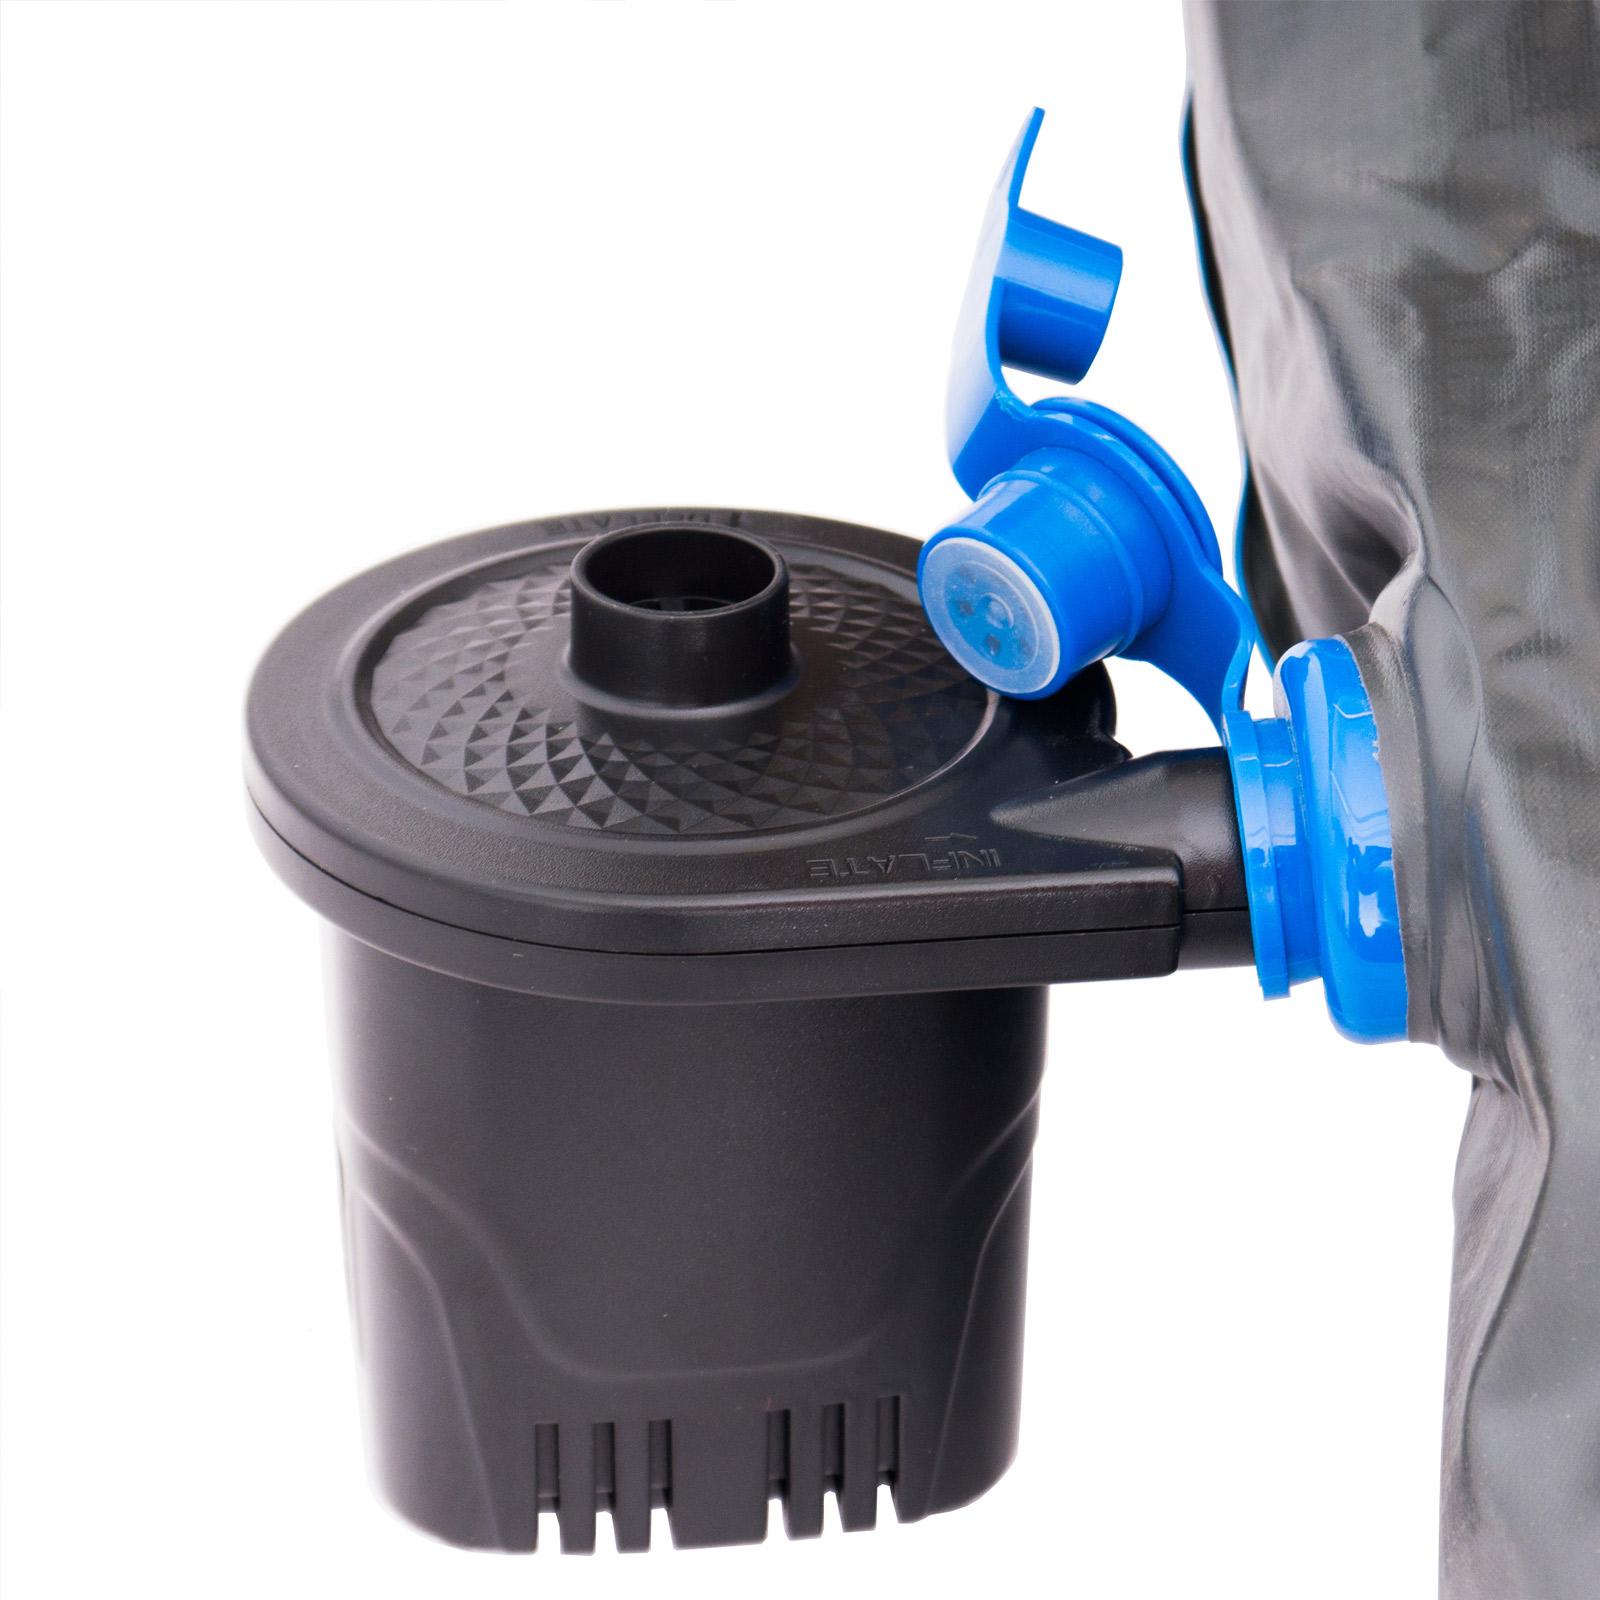 HUMAN COMFORT Akku Pumpe Camping Elektropumpe Luftpumpe Elektrisch USB aufladbar